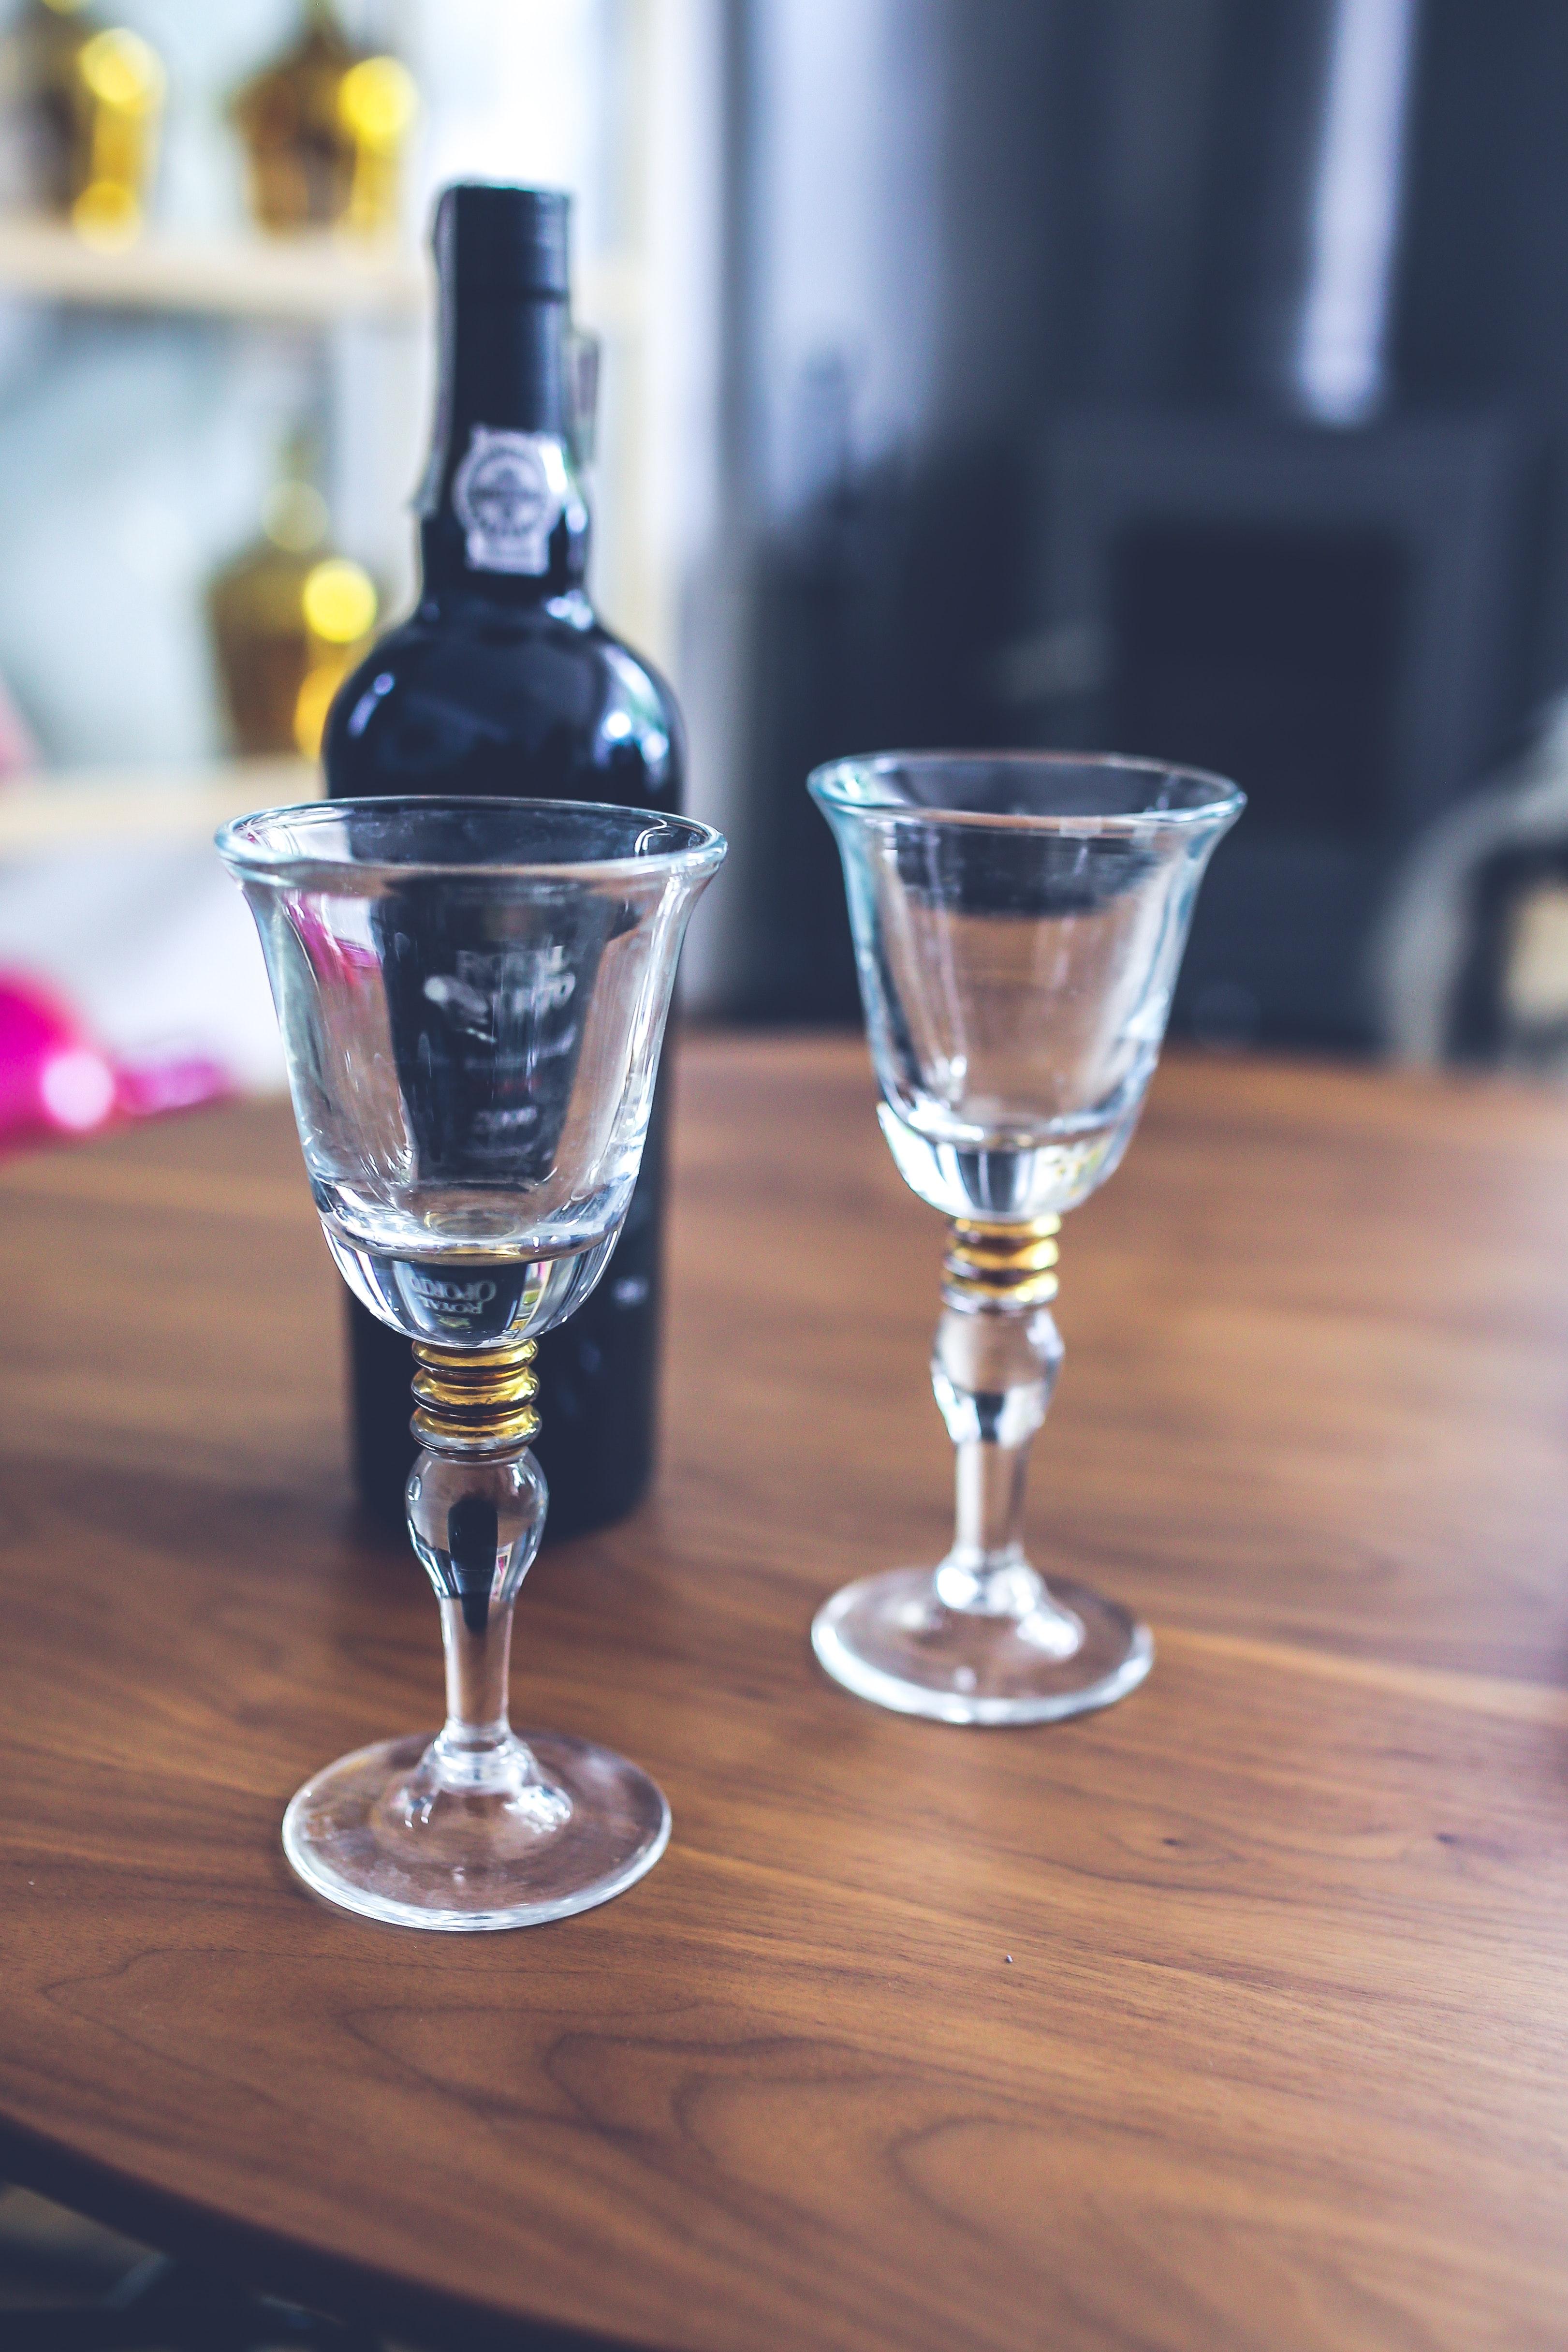 Two wine glasses & bottle photo